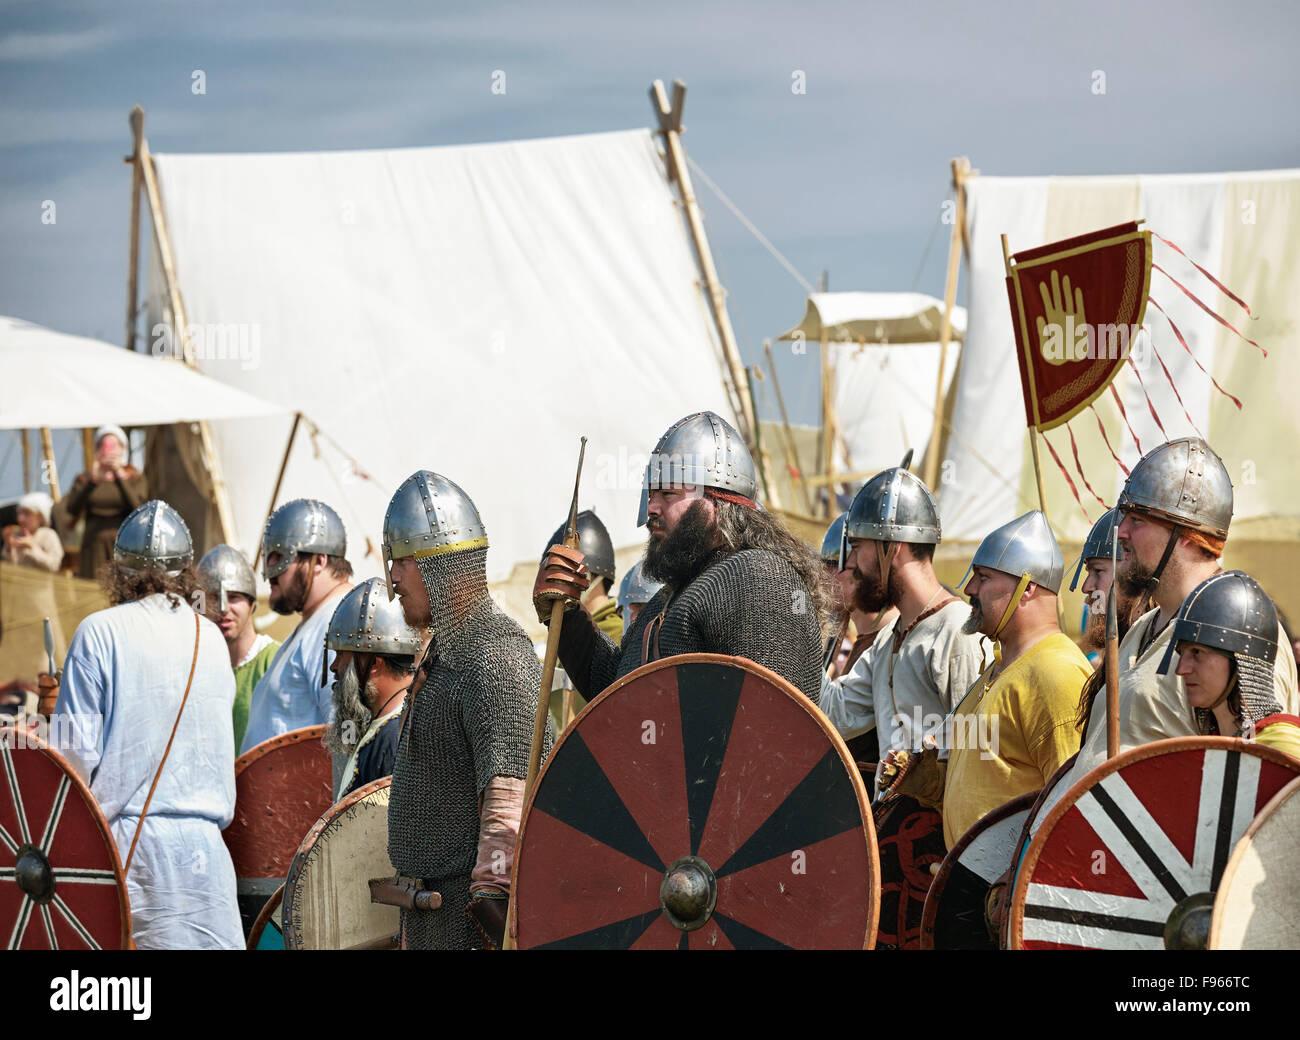 Vikings in battle reenactment at Icelandic Festival, Gimli, Manitoba, Canada - Stock Image